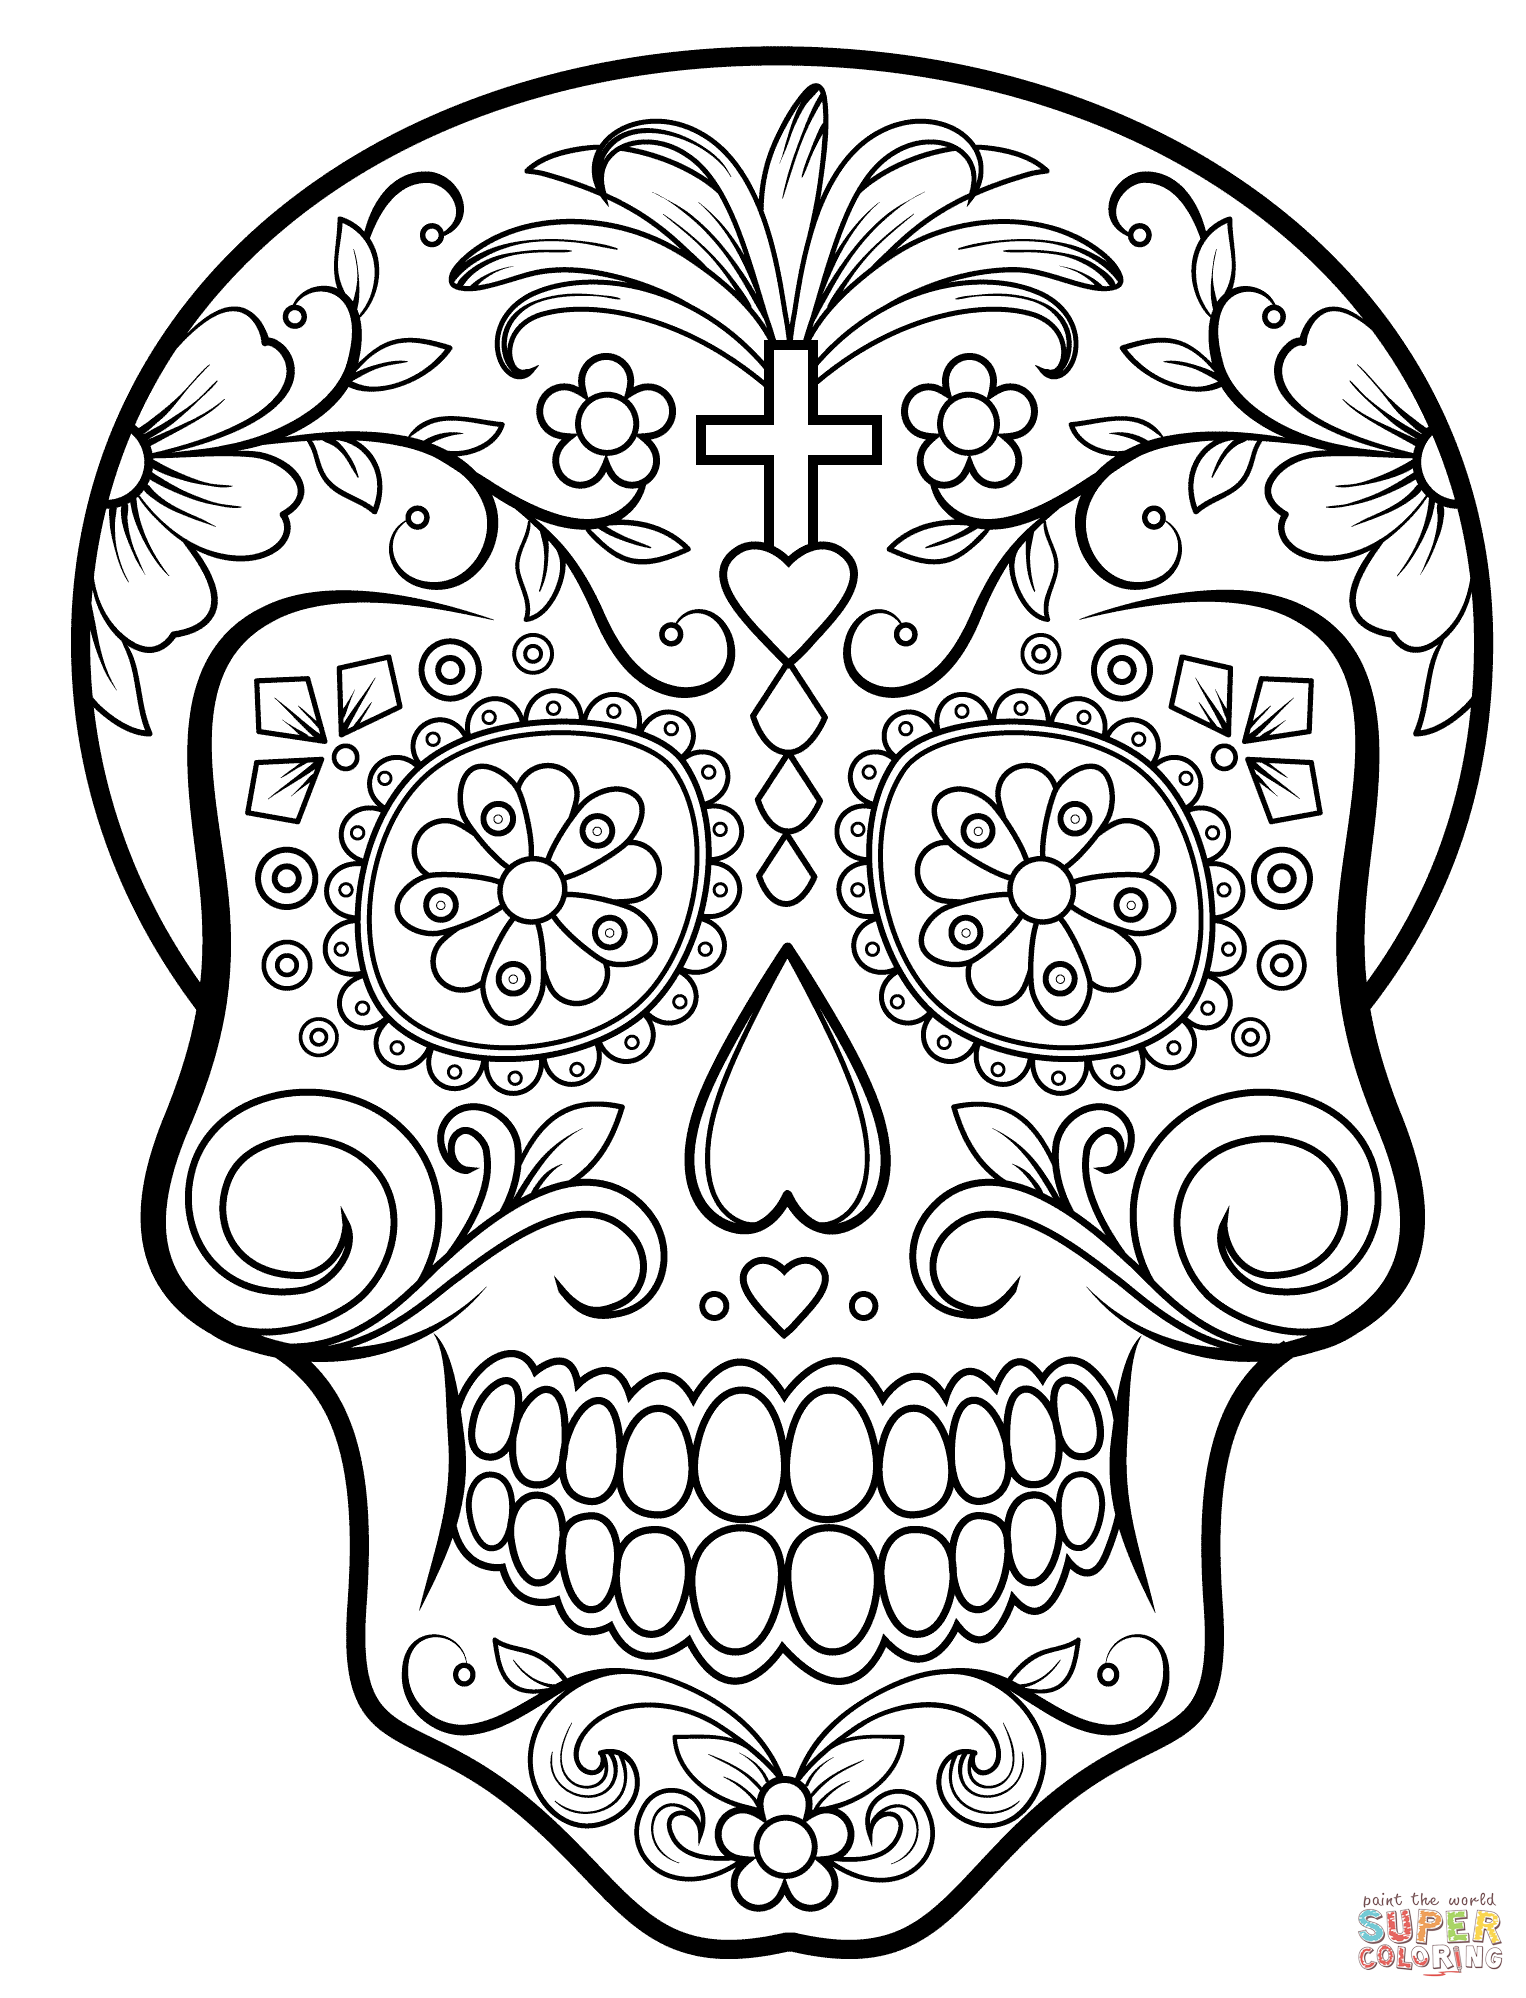 HD Quality Wallpaper | Collection: Artistic, 1526x1998 Sugar Skull